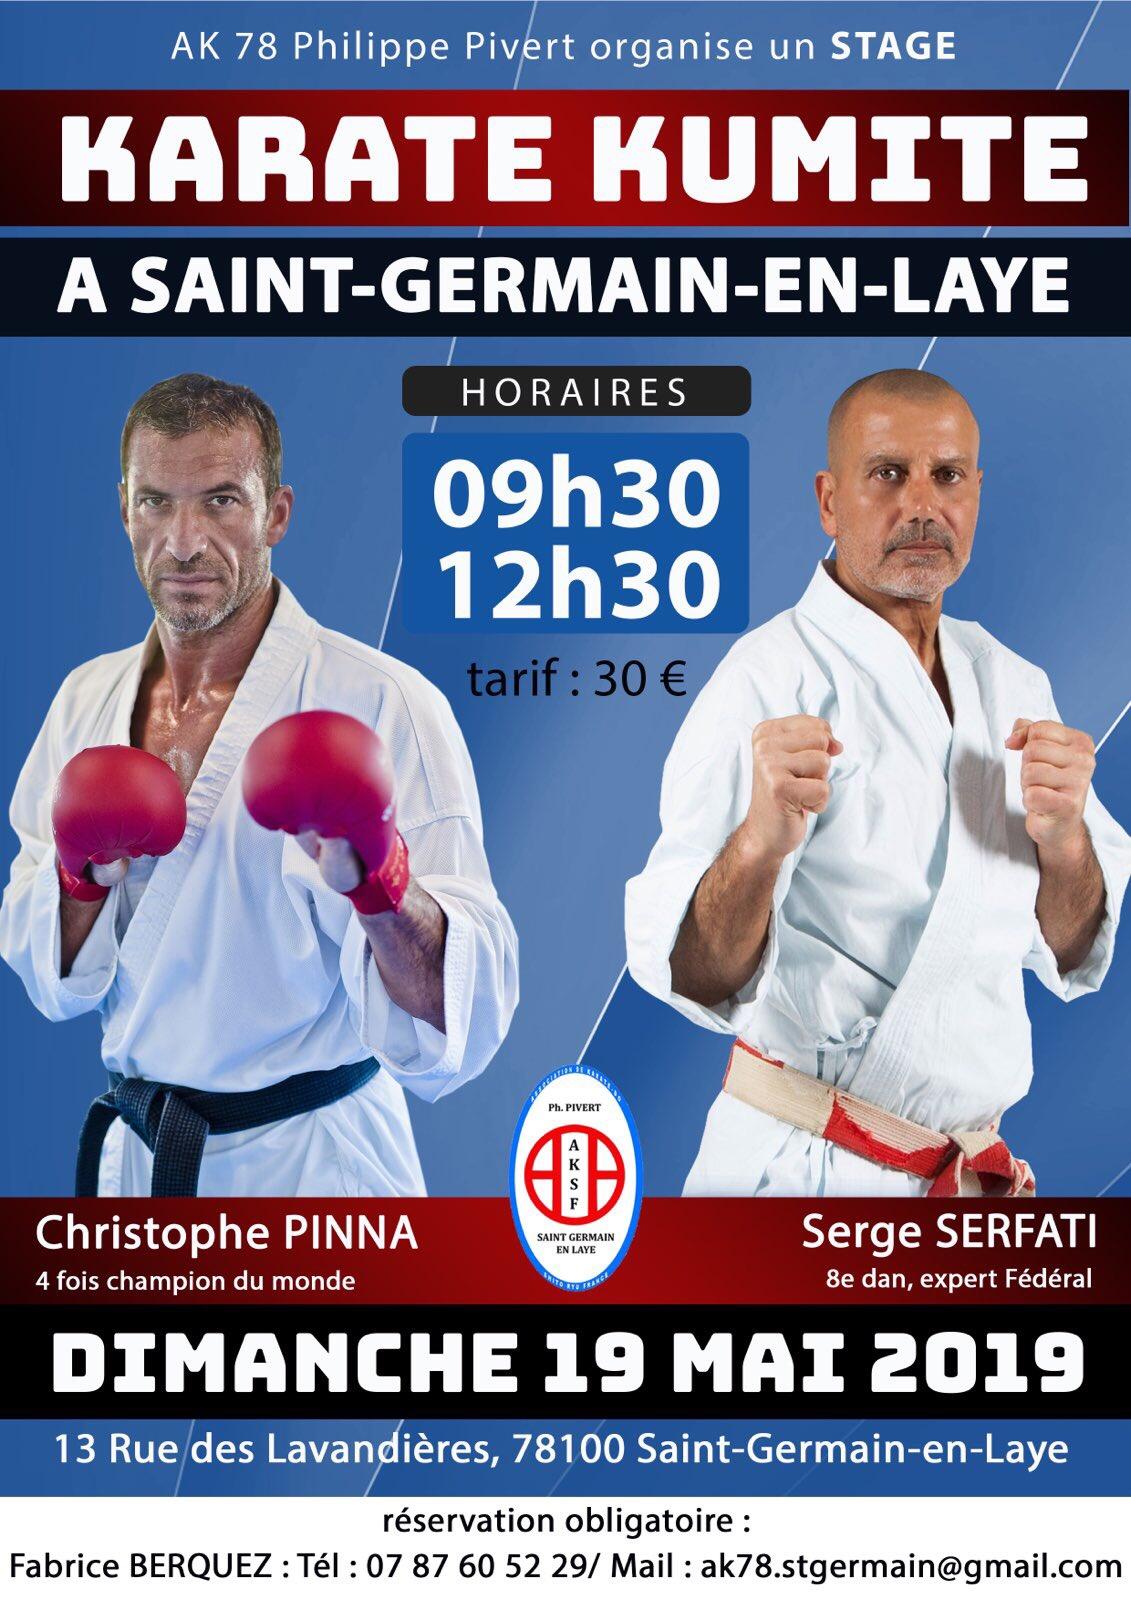 Stage kumite avec Serge Serfati et Christophe Pinna